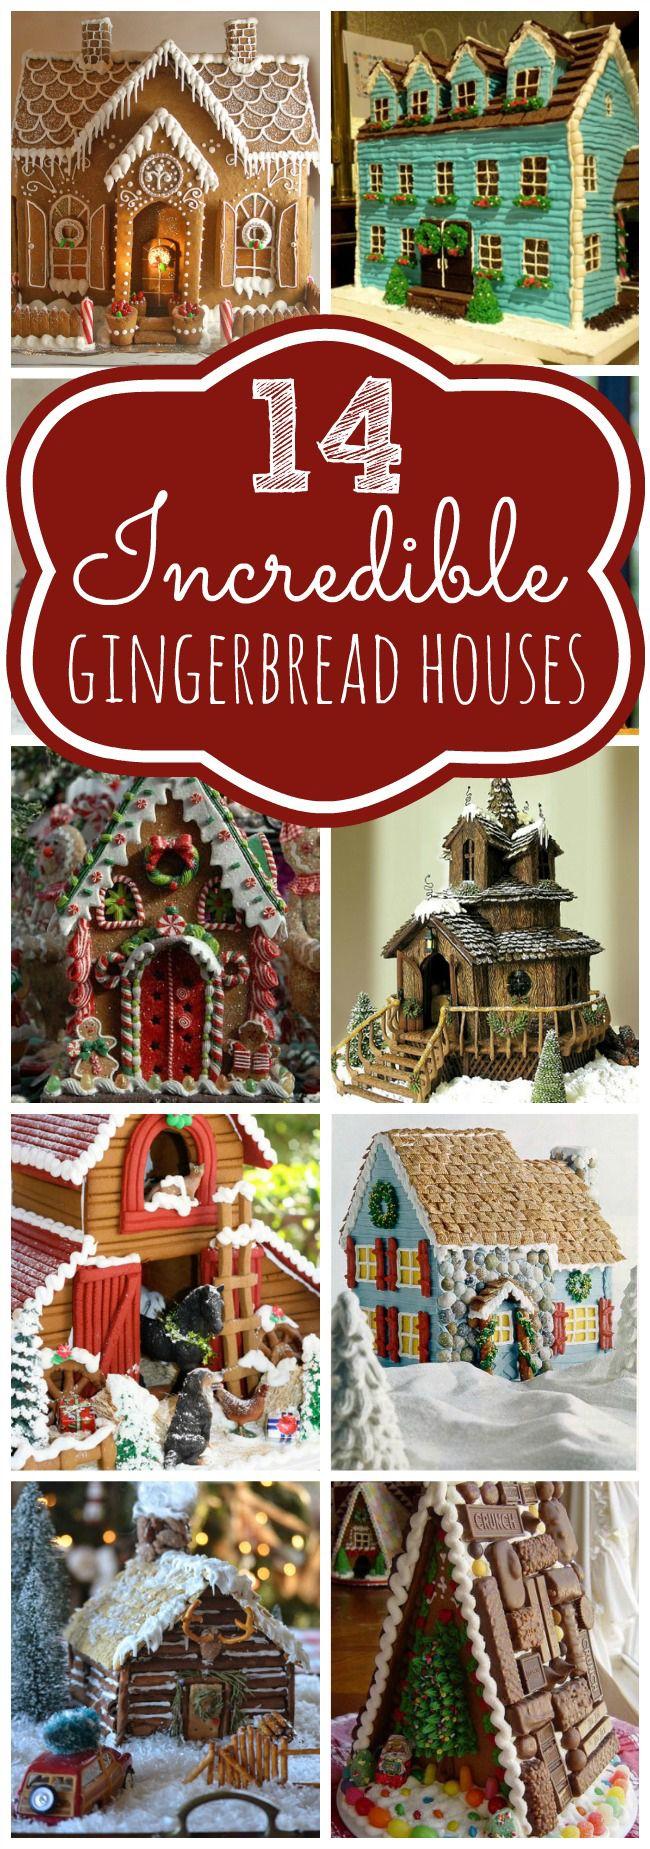 14 Incredible Gingerbread Houses | Favorite Food Bloggers ... on fudge box, ginger box, brownies box, cookie dough box, halloween box, gumbo box, rose box, church box, cupcake house box, biscotti box, pig roast box, candy box, text box, fireplace box, ornament box, icing box, panettone box, giveaway box, butterfly box, tiramisu box,